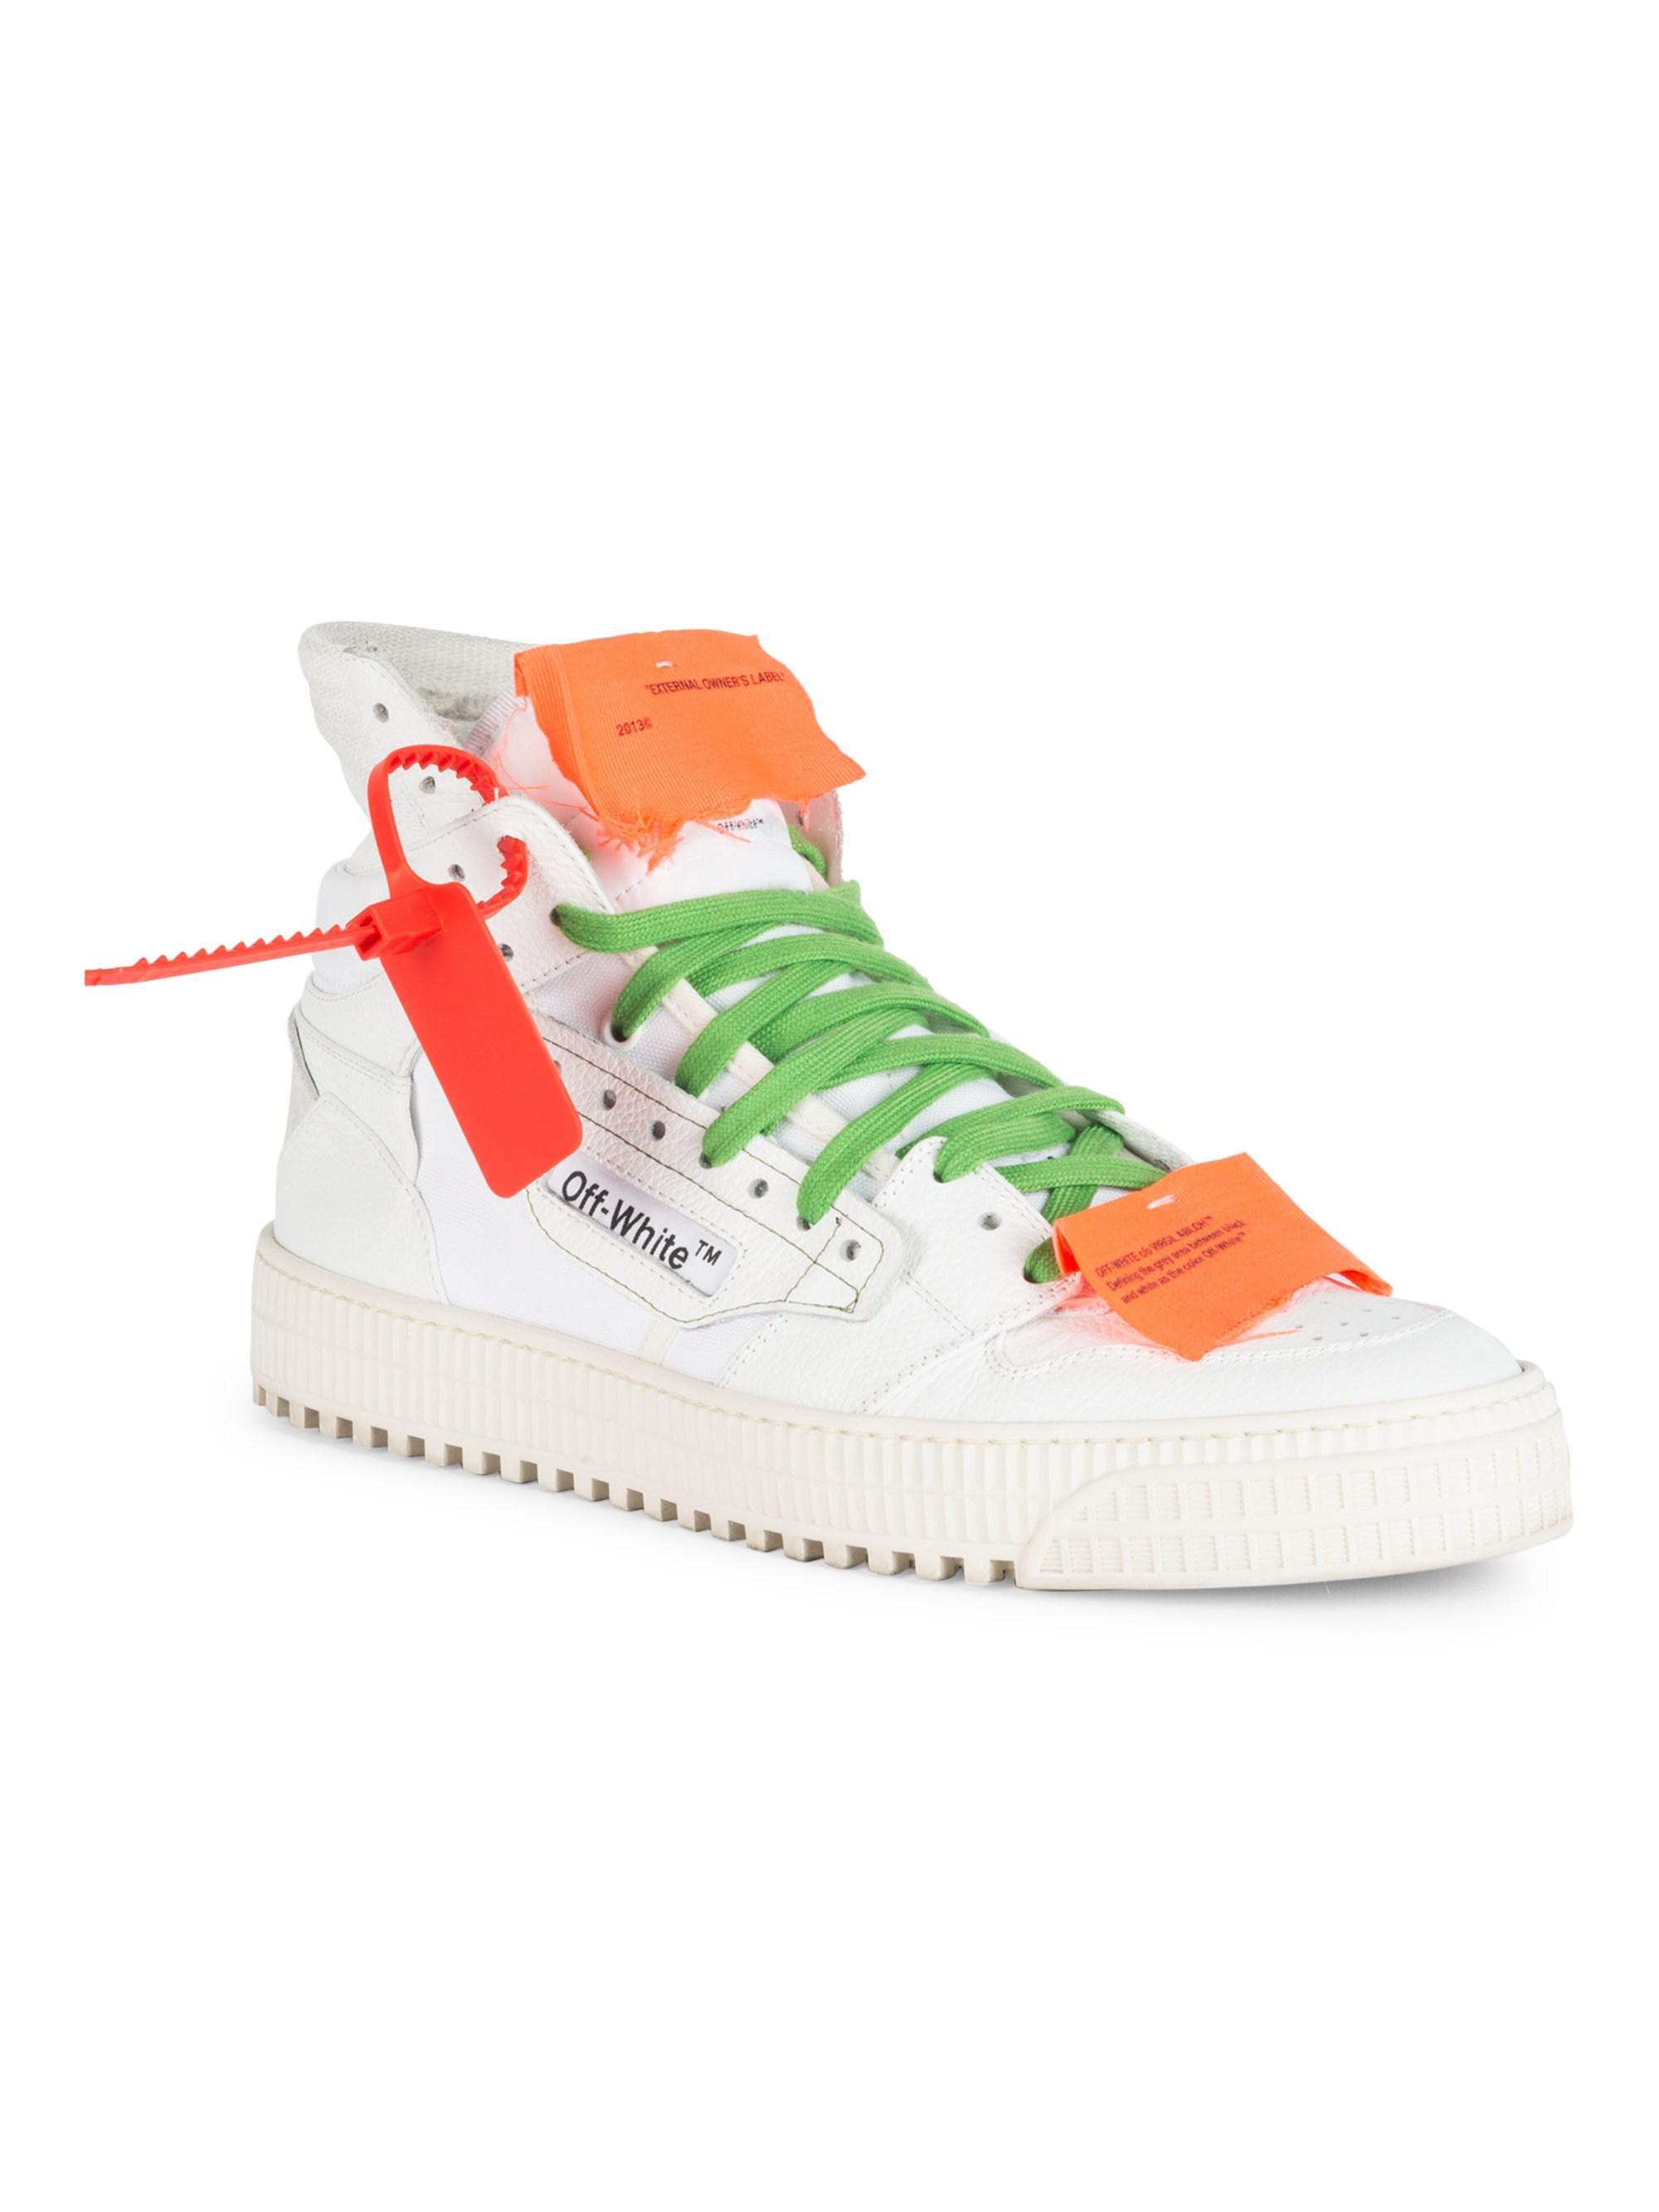 662f9bab50e5e7 Lyst - Off-White c/o Virgil Abloh Men's Low 3.0 High Top Sneaker ...